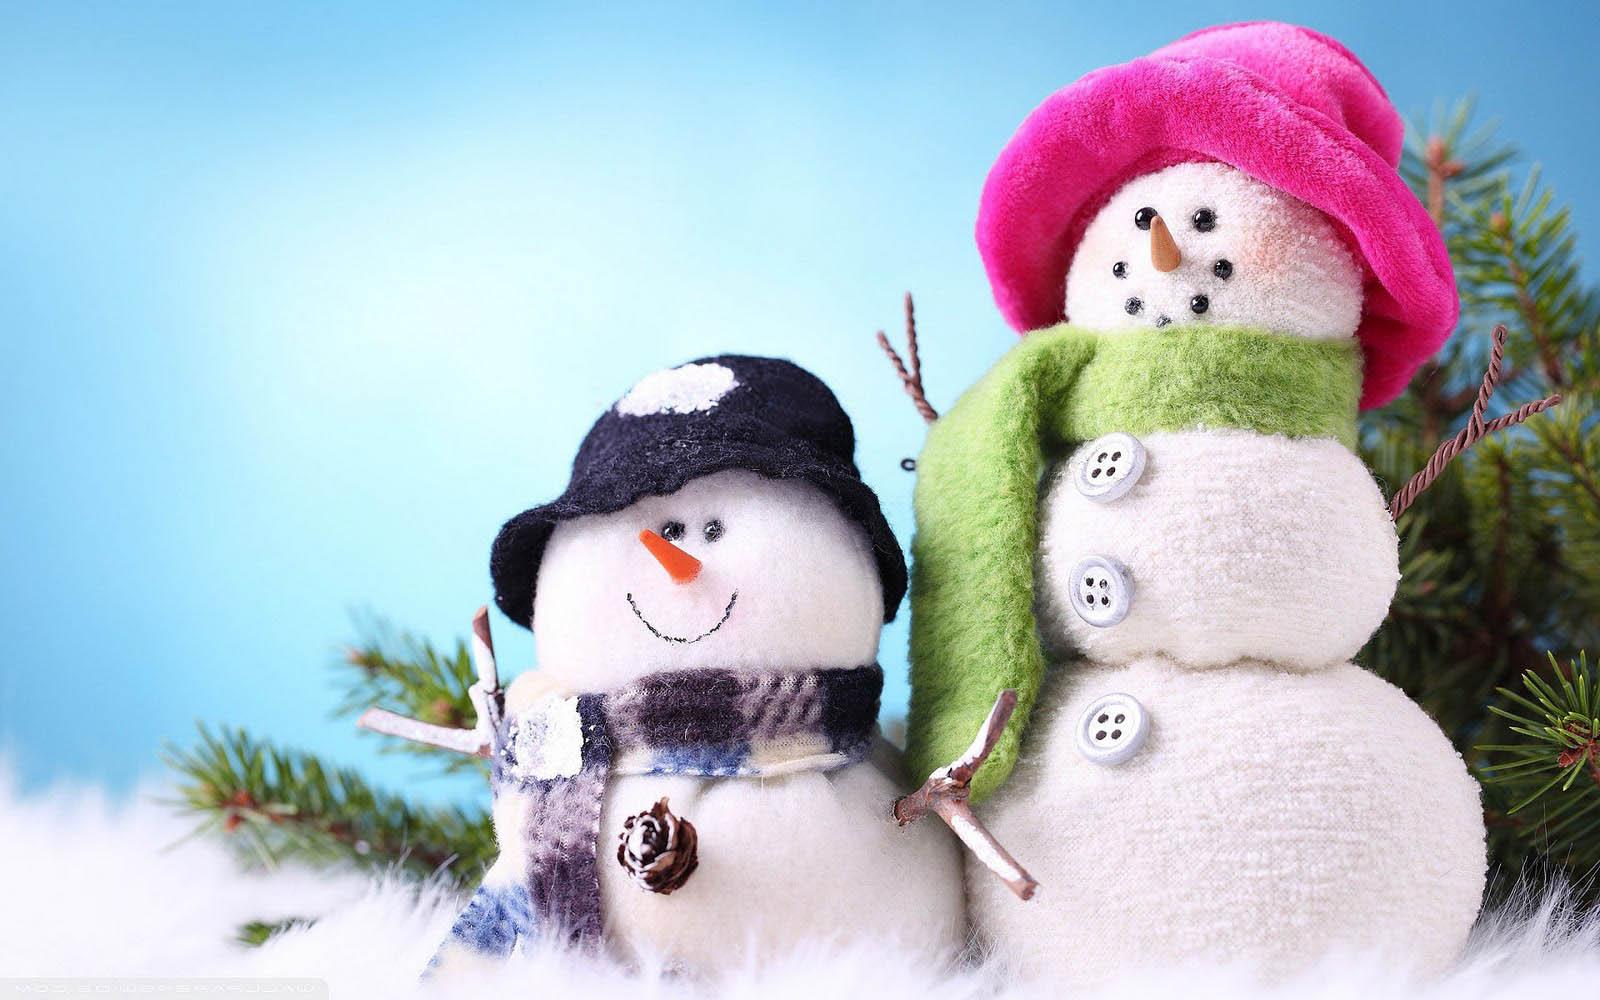 Snowman Wallpaper Image Picture